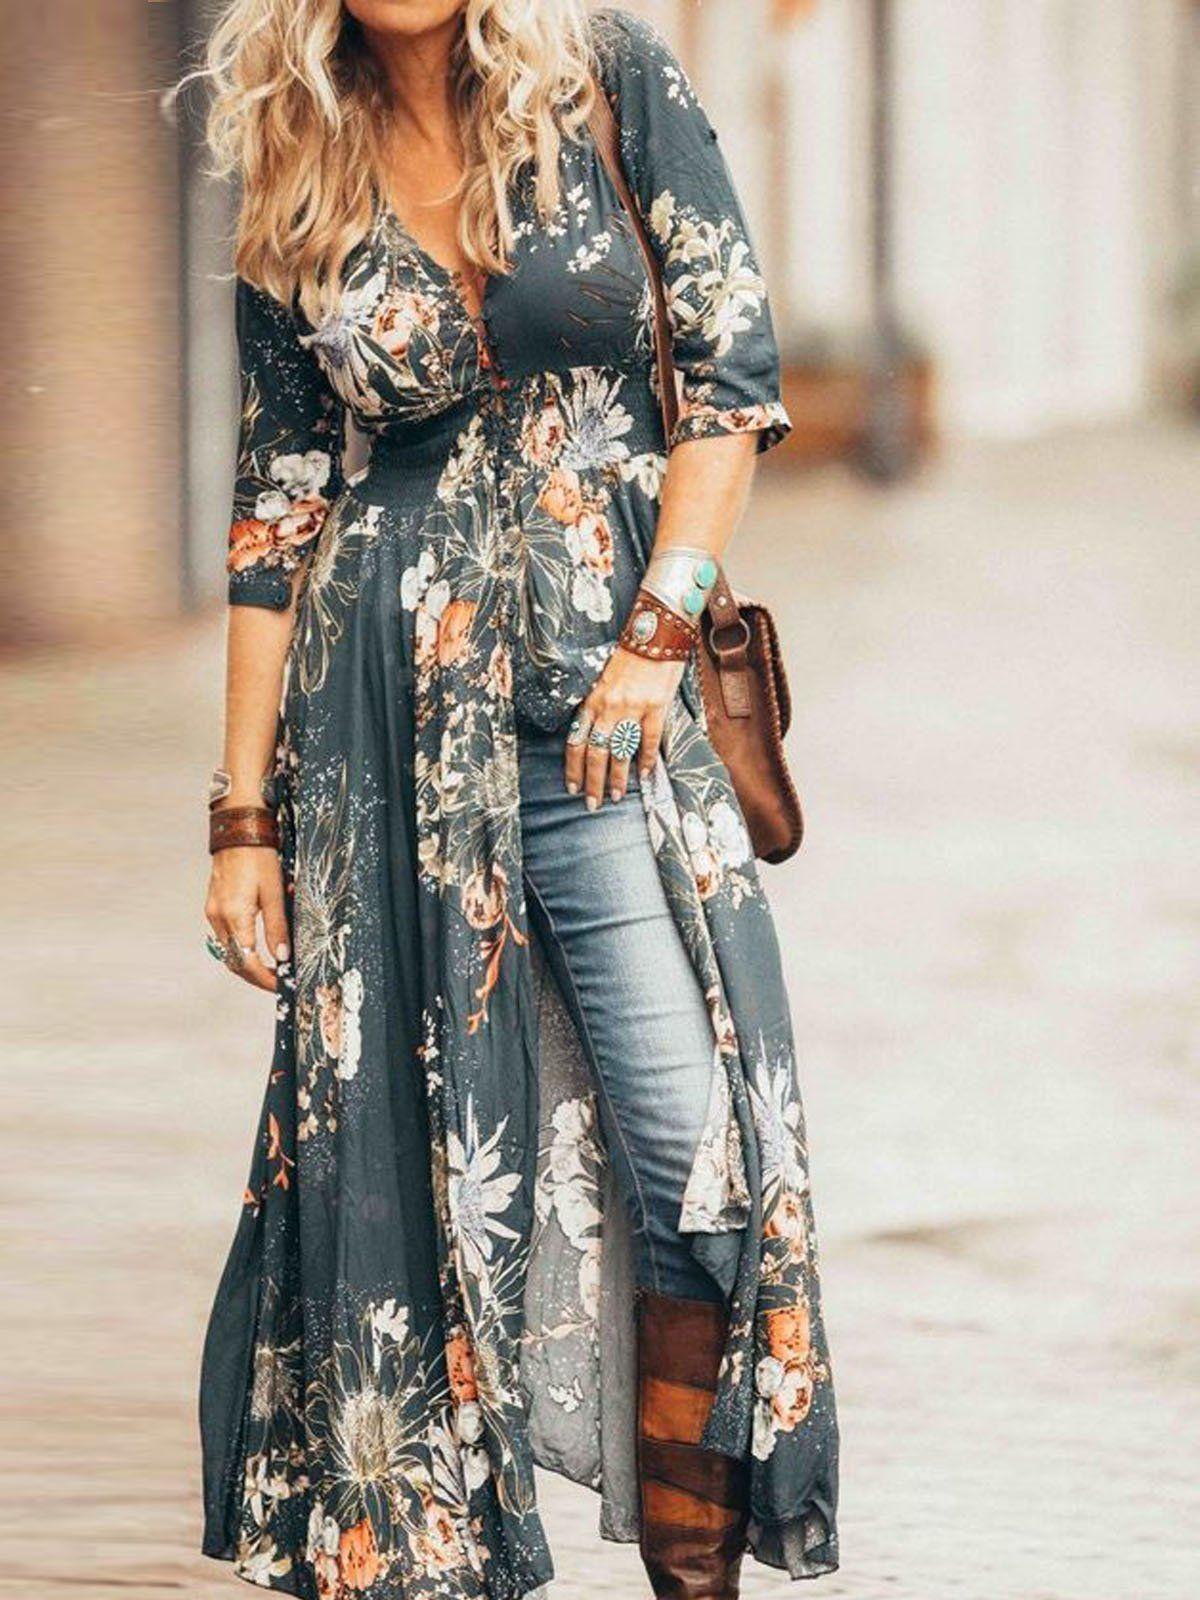 3 4 Sleeve Floral Boho Chic Maxi Dress Fullfitting Maxi Dress Boho Chic Boho Chic Dress Boho Outfits [ 1600 x 1200 Pixel ]